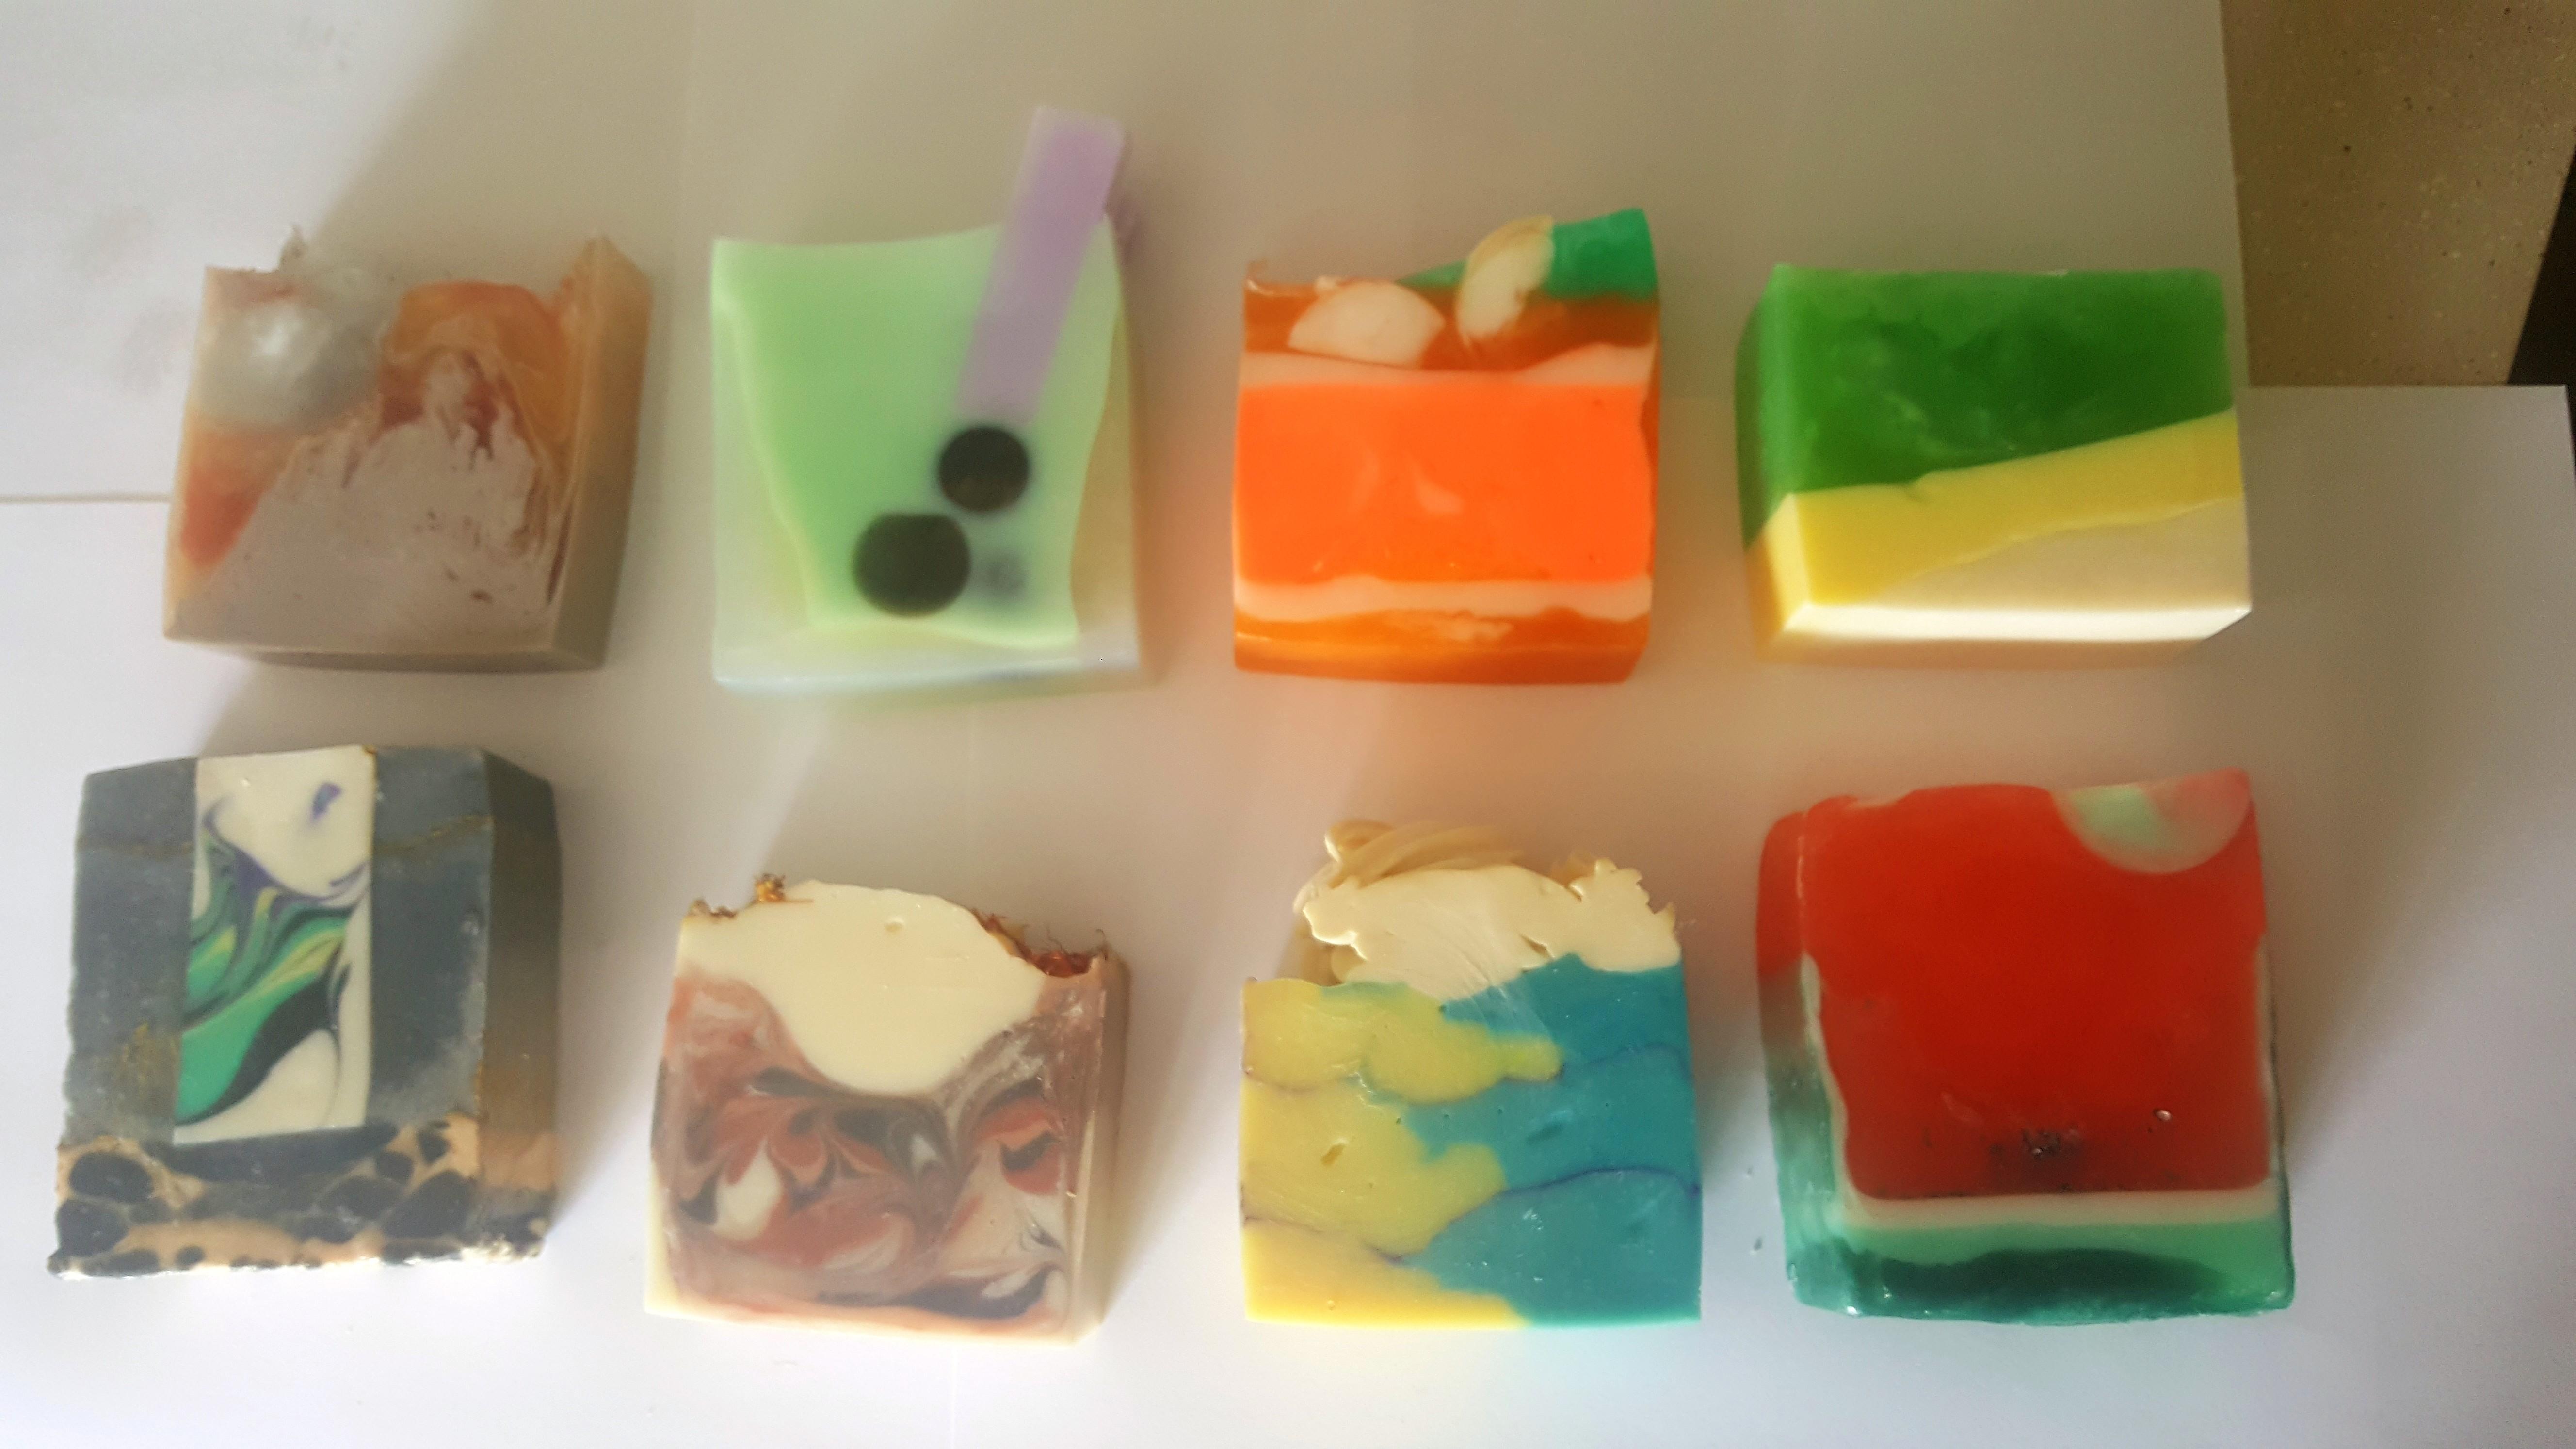 30 June 2018 - Handmade soaps